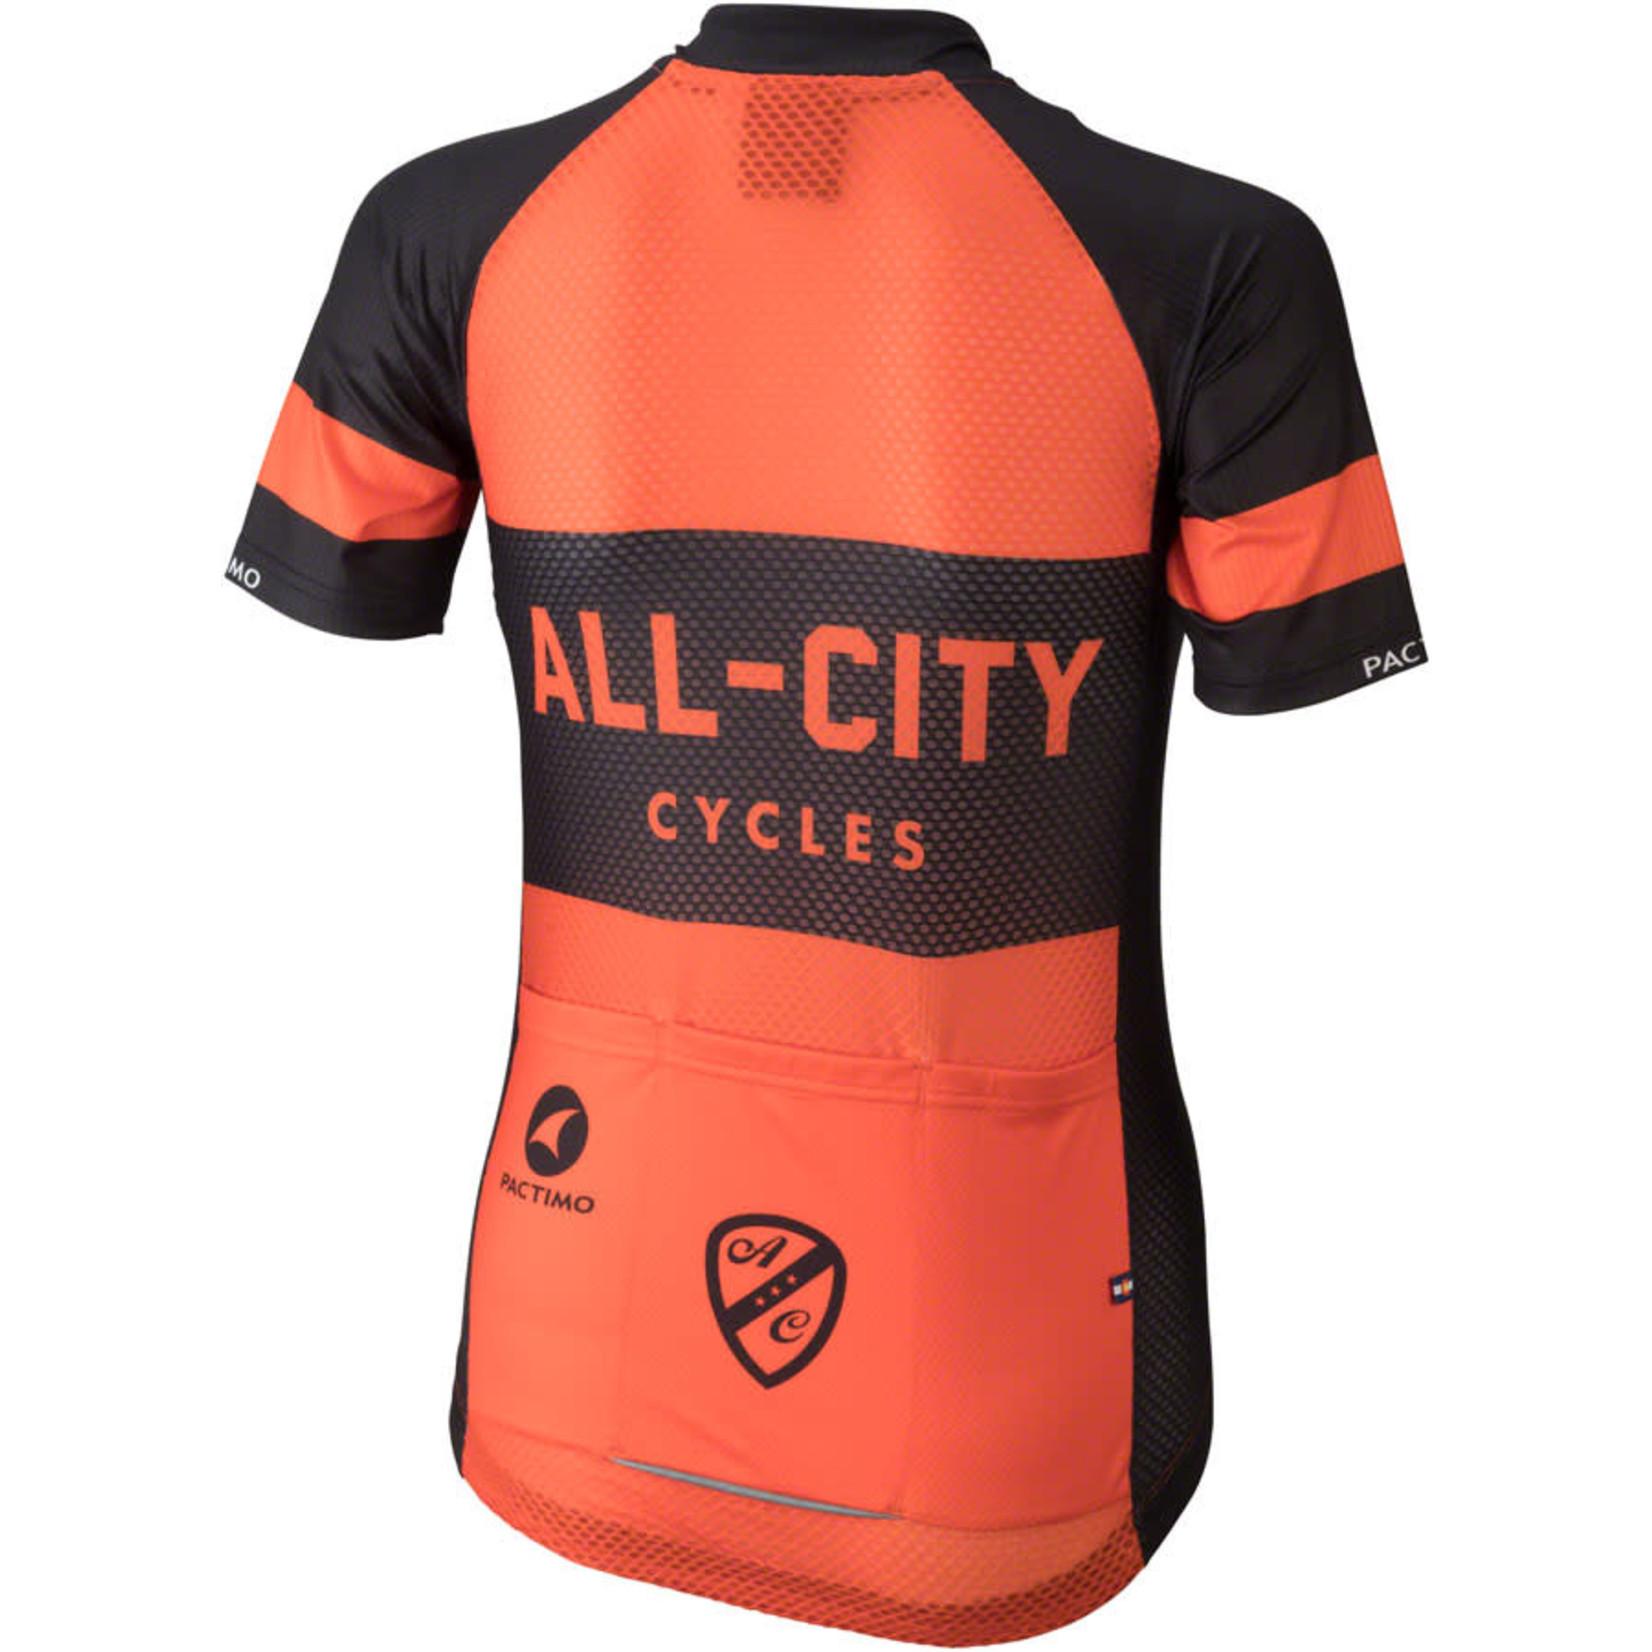 All-City All-City Classic Jersey - Orange, Short Sleeve, Women's, X-Small